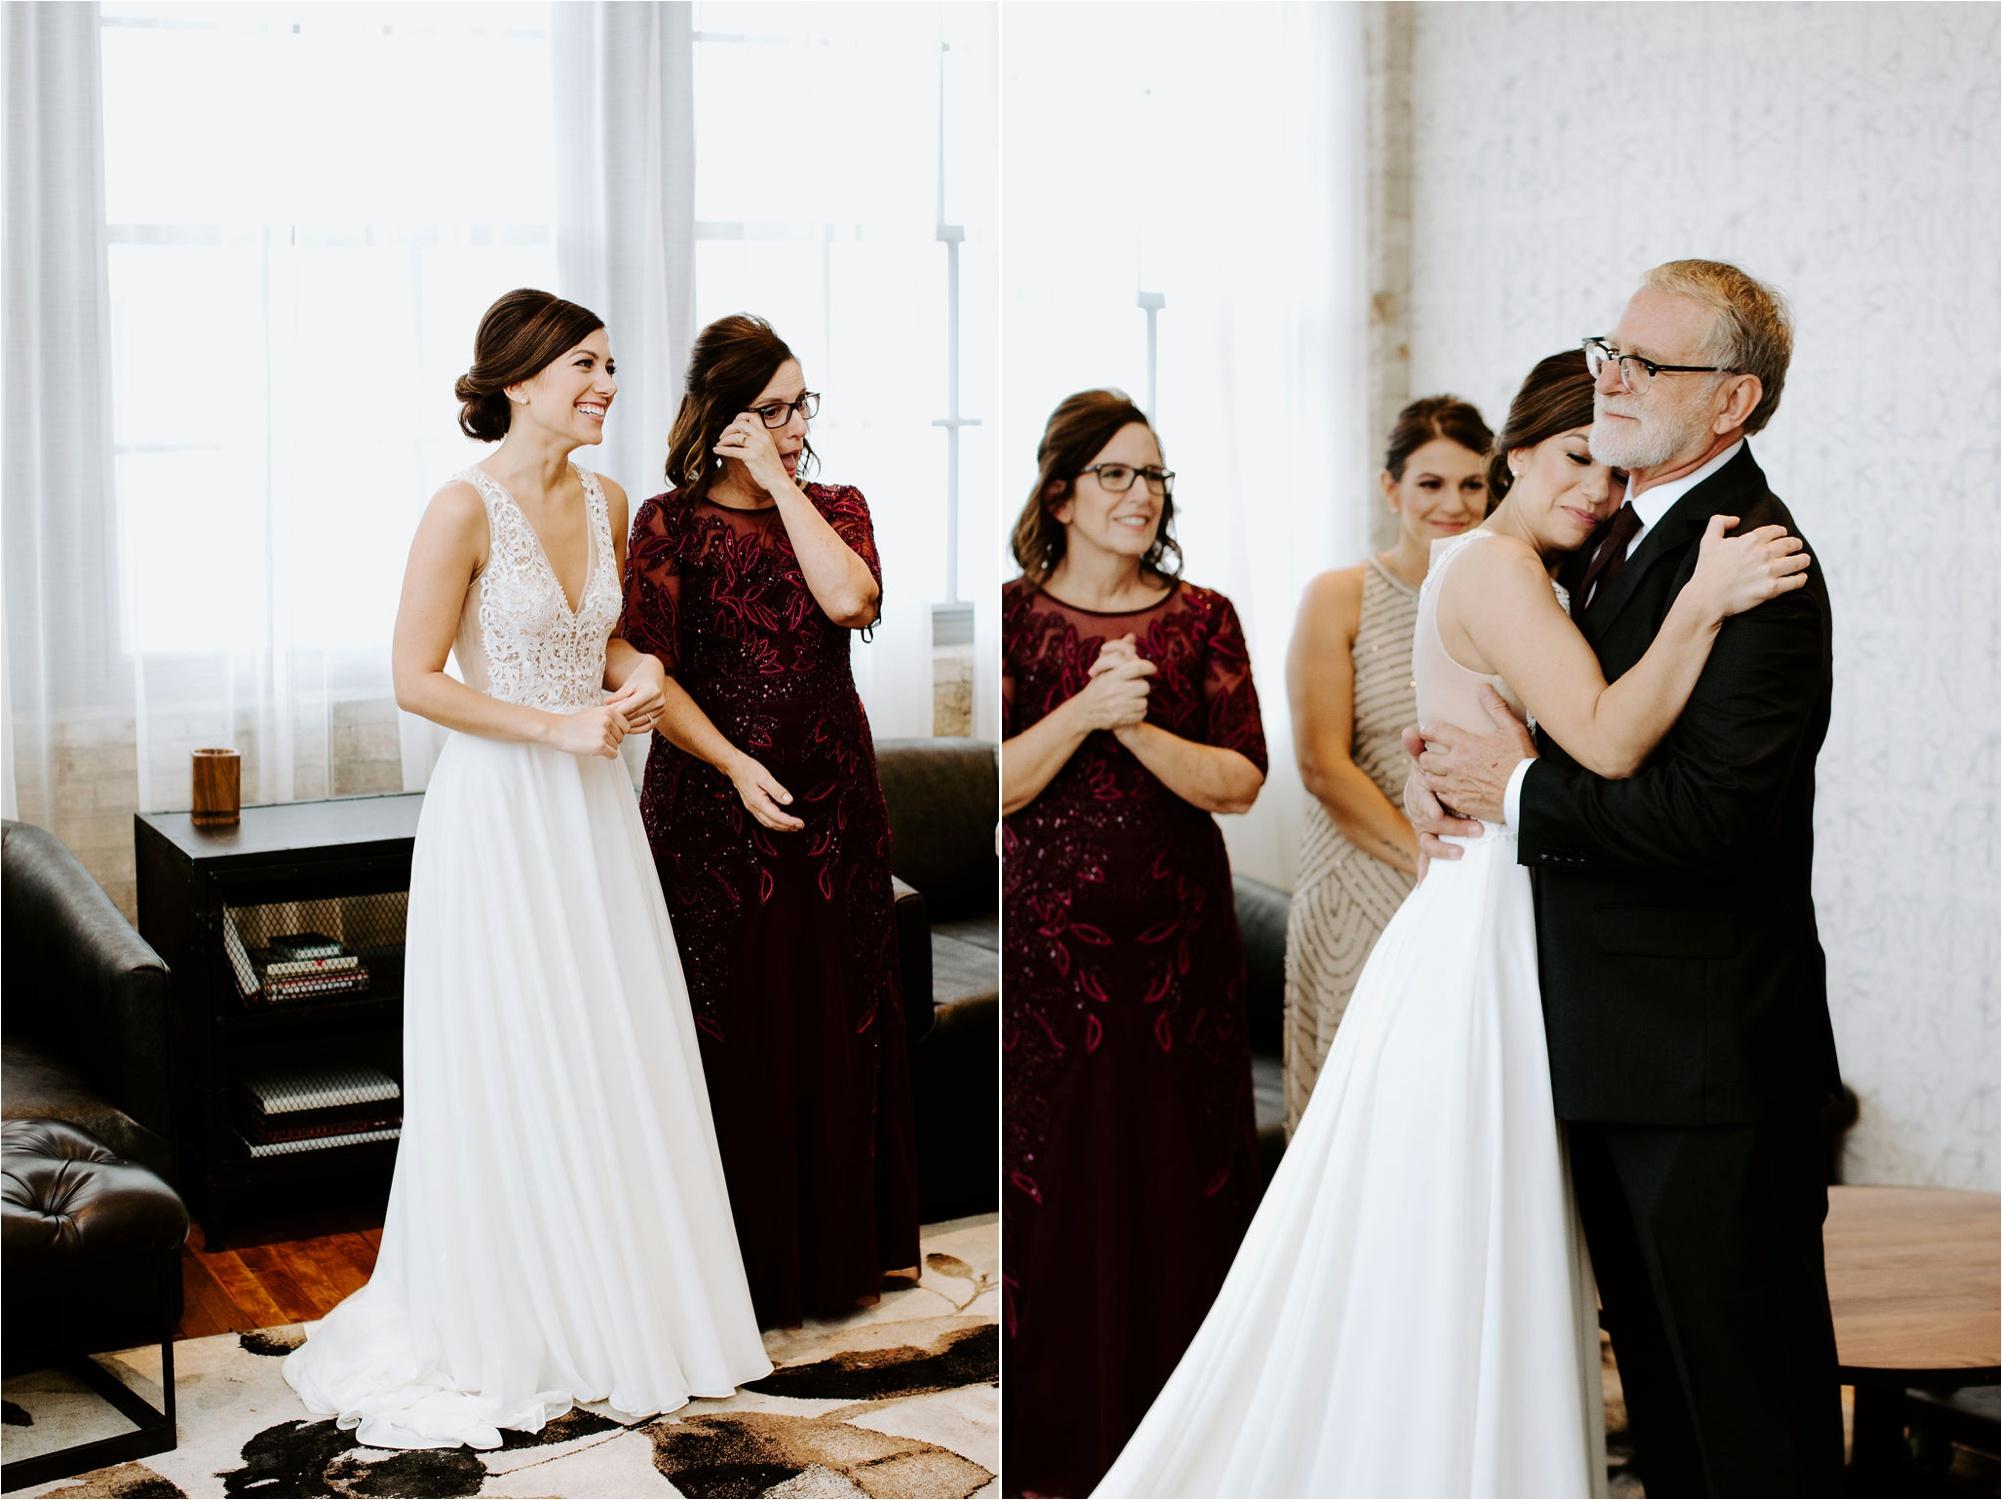 Rainy Machine Shop Minneapolis Fall Wedding Rachel And Ty Ali Leigh Photo,Second Wedding Wedding Dress Mature Bride